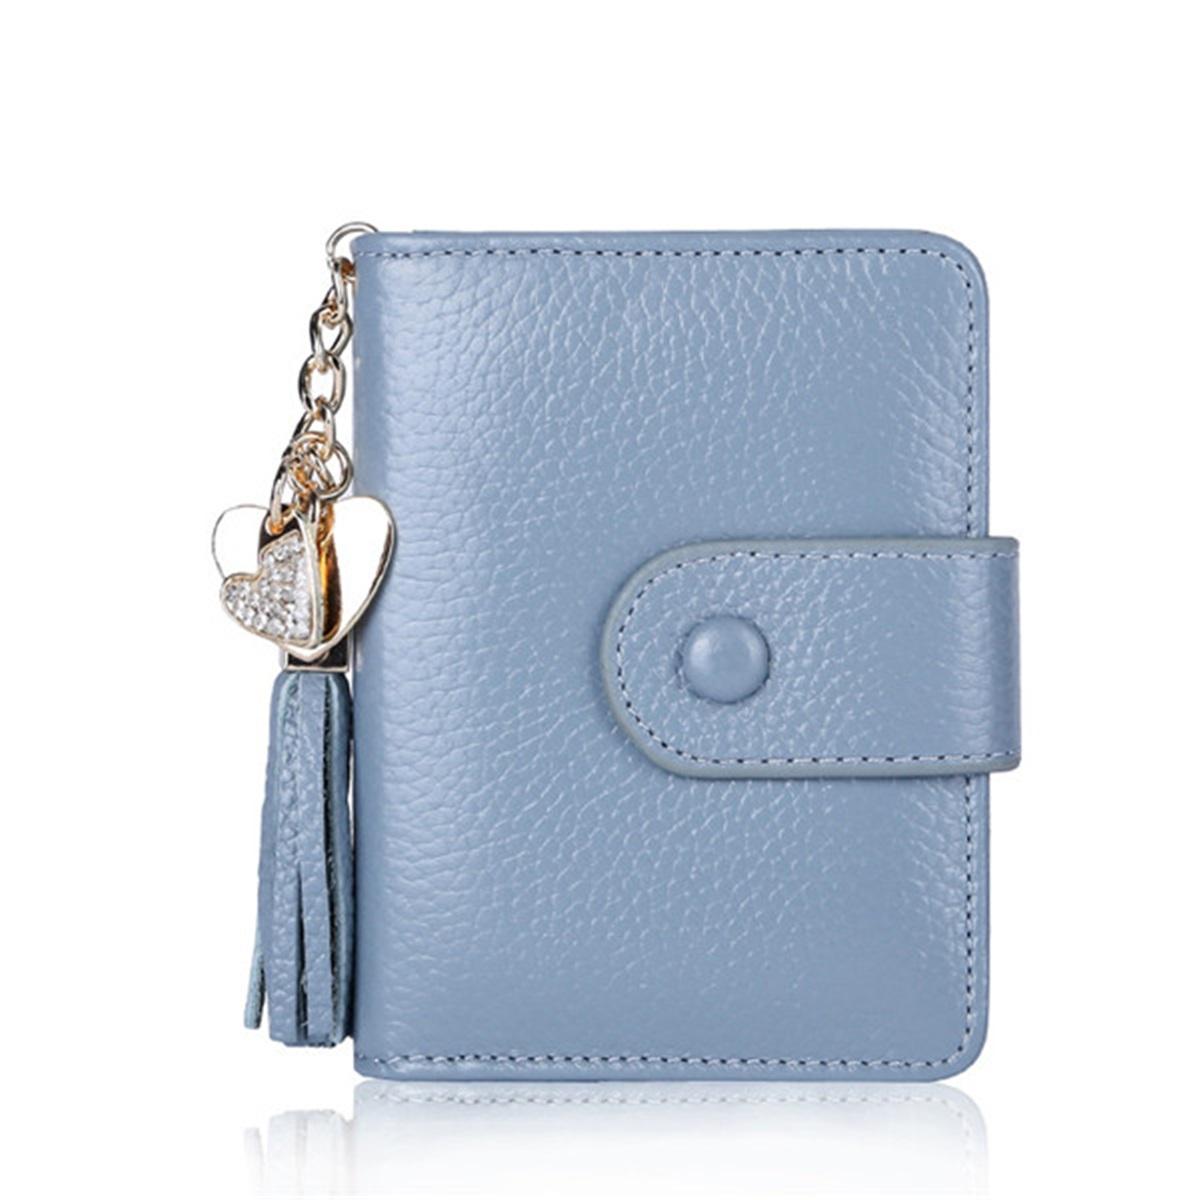 Women Genuine Leather Wallet ID Credit Card Holder Bag Passport Purse Outdoor Travel